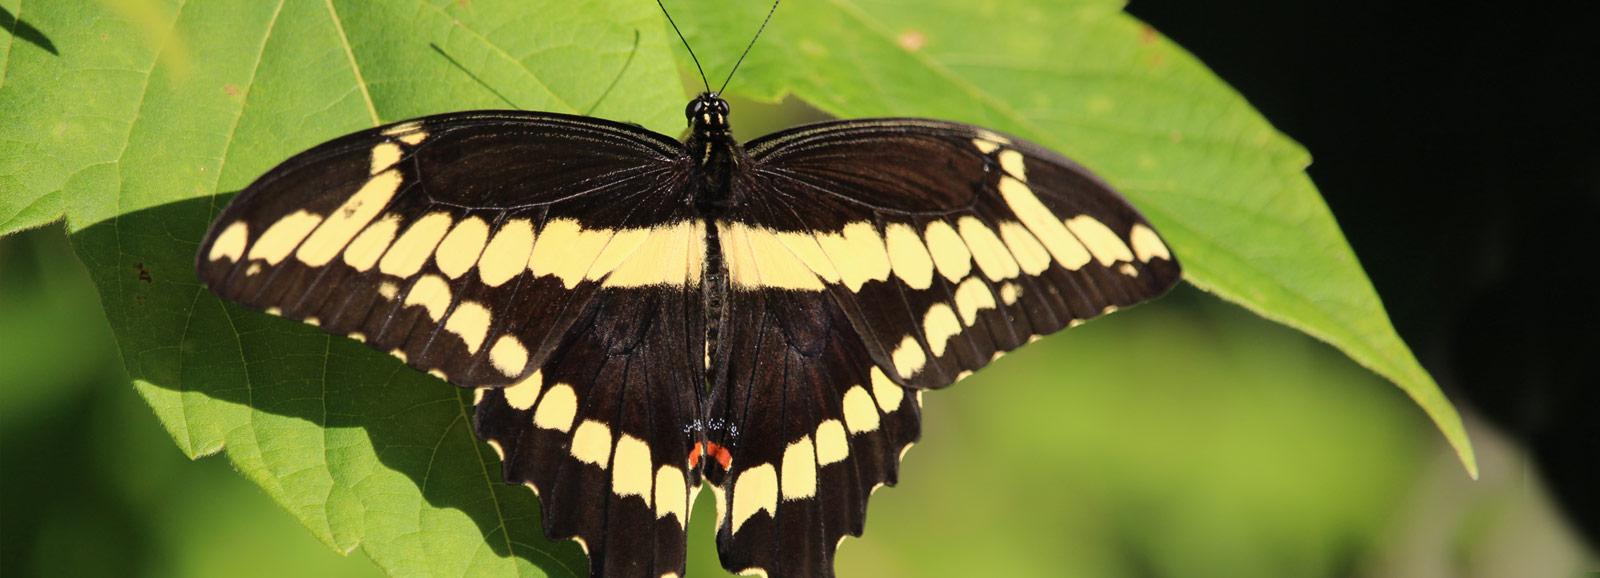 slider-swallowtail